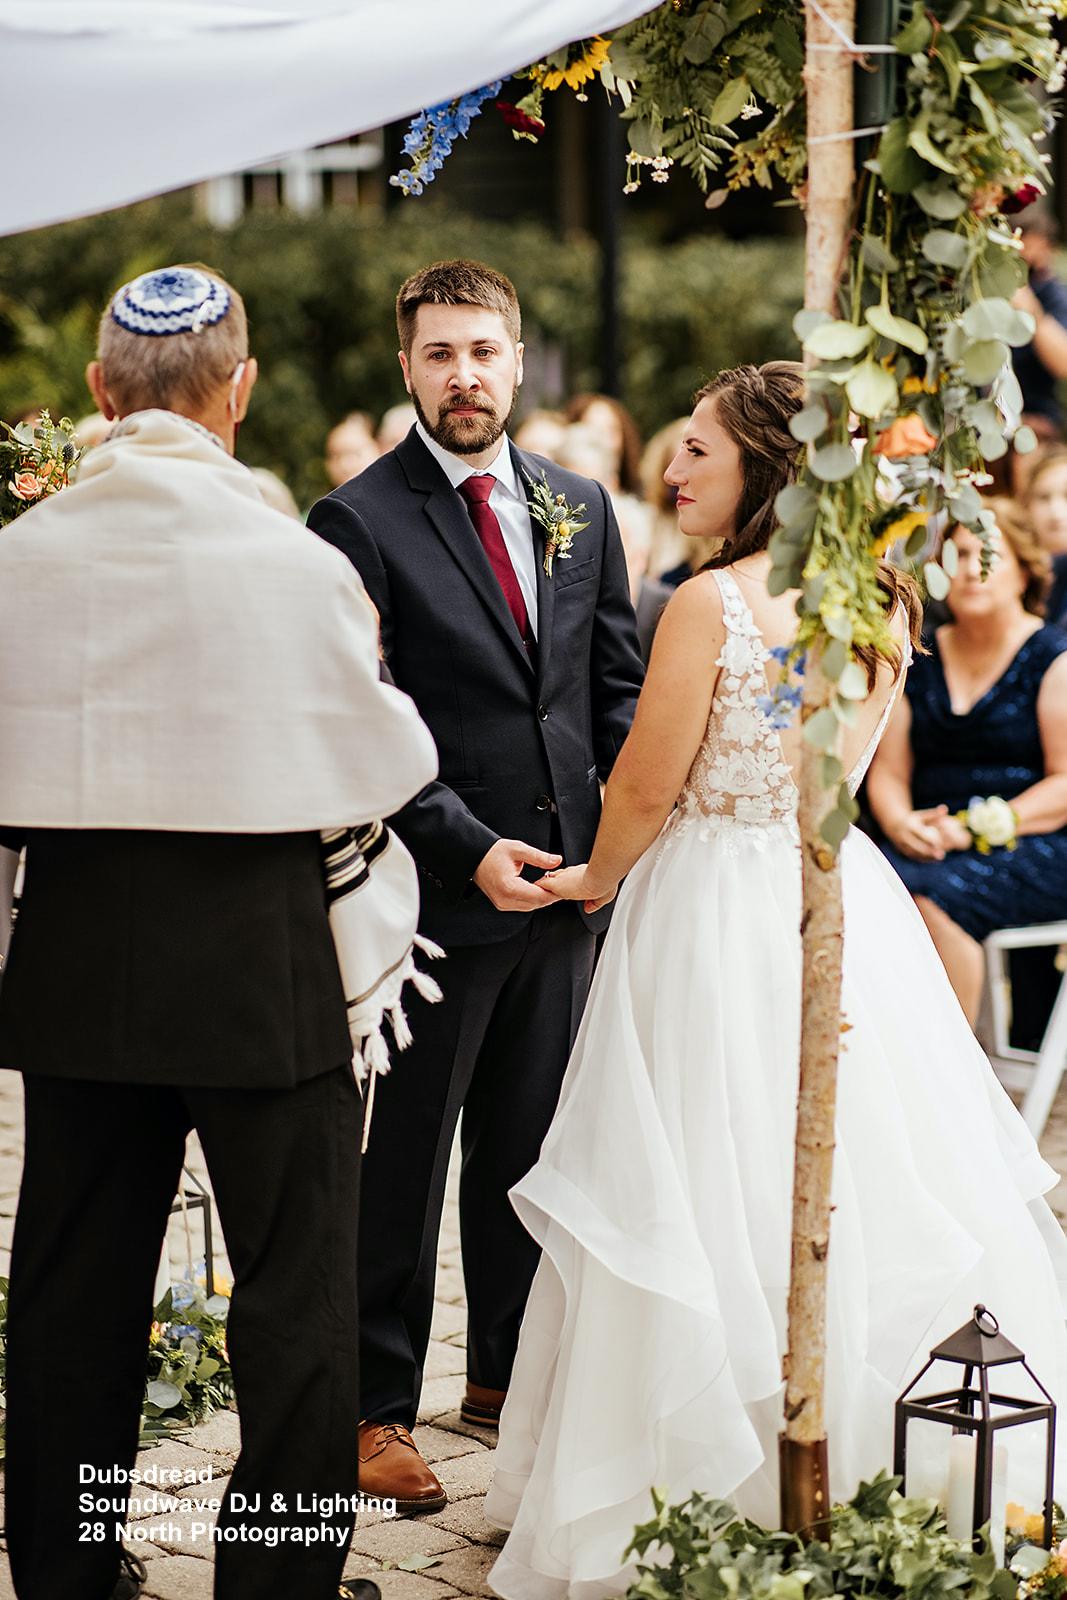 Dubsdread Soundwave Wedding Ceremony